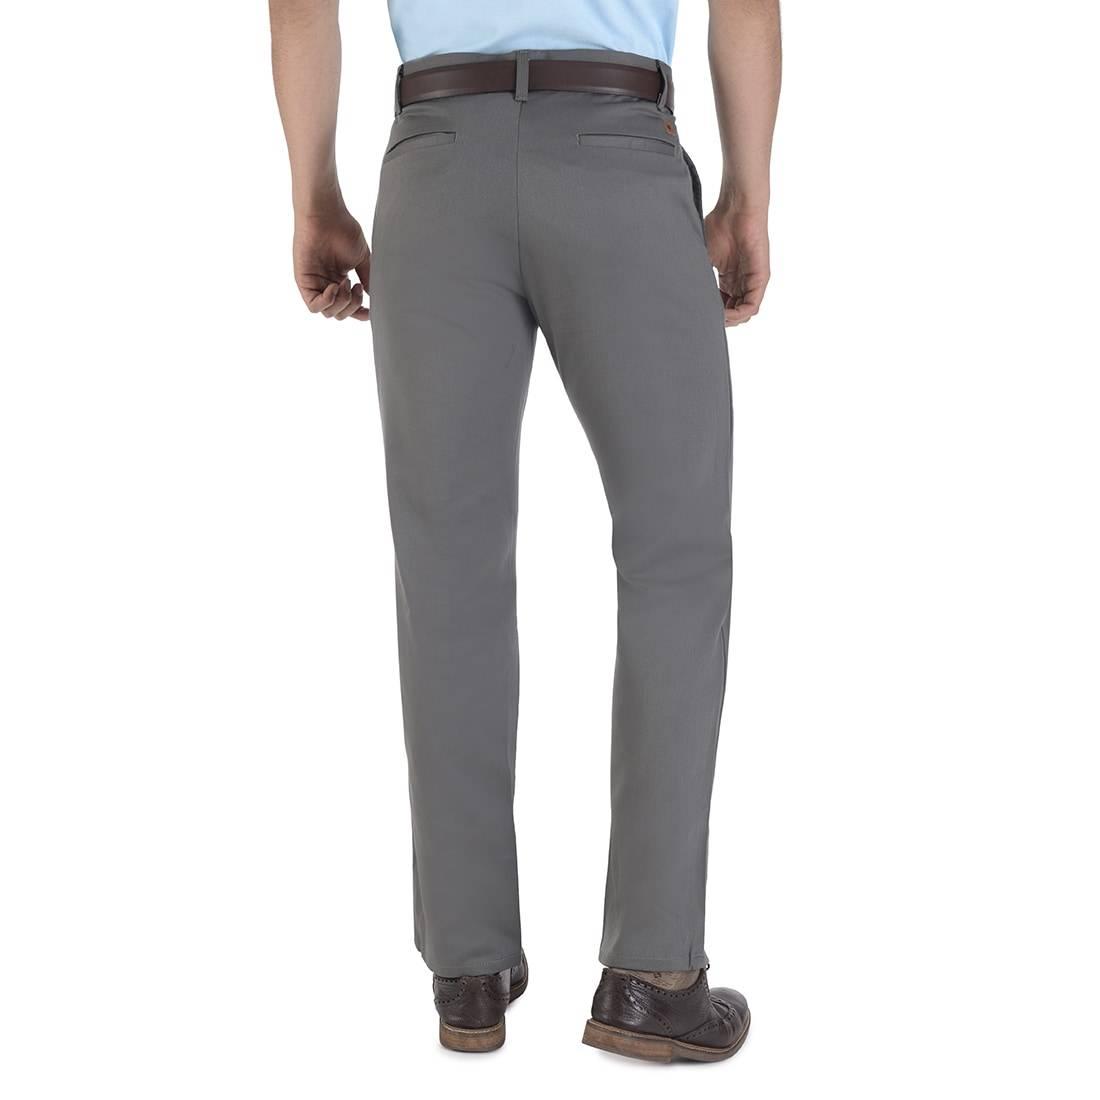 010920418906-02-Pantalon-Casual-Slim-Fit-Oxford-yale